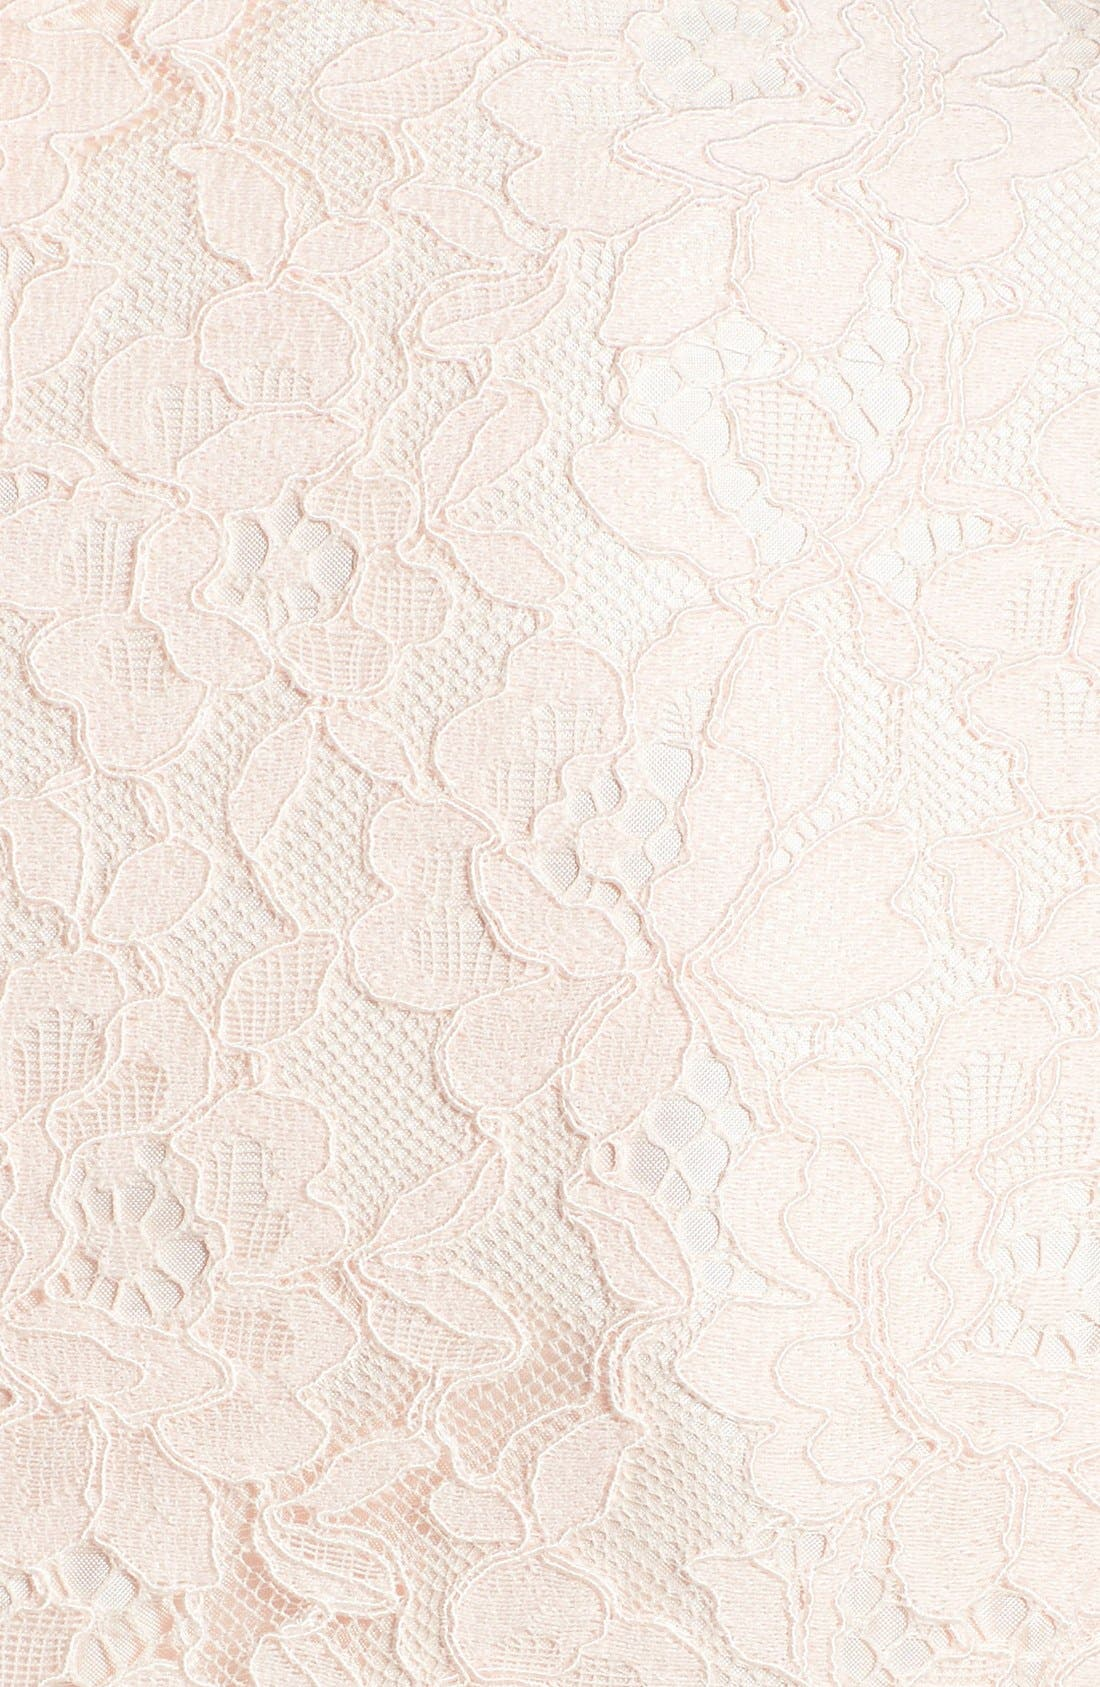 'Valeria' Lace Sheath Dress,                             Alternate thumbnail 3, color,                             650